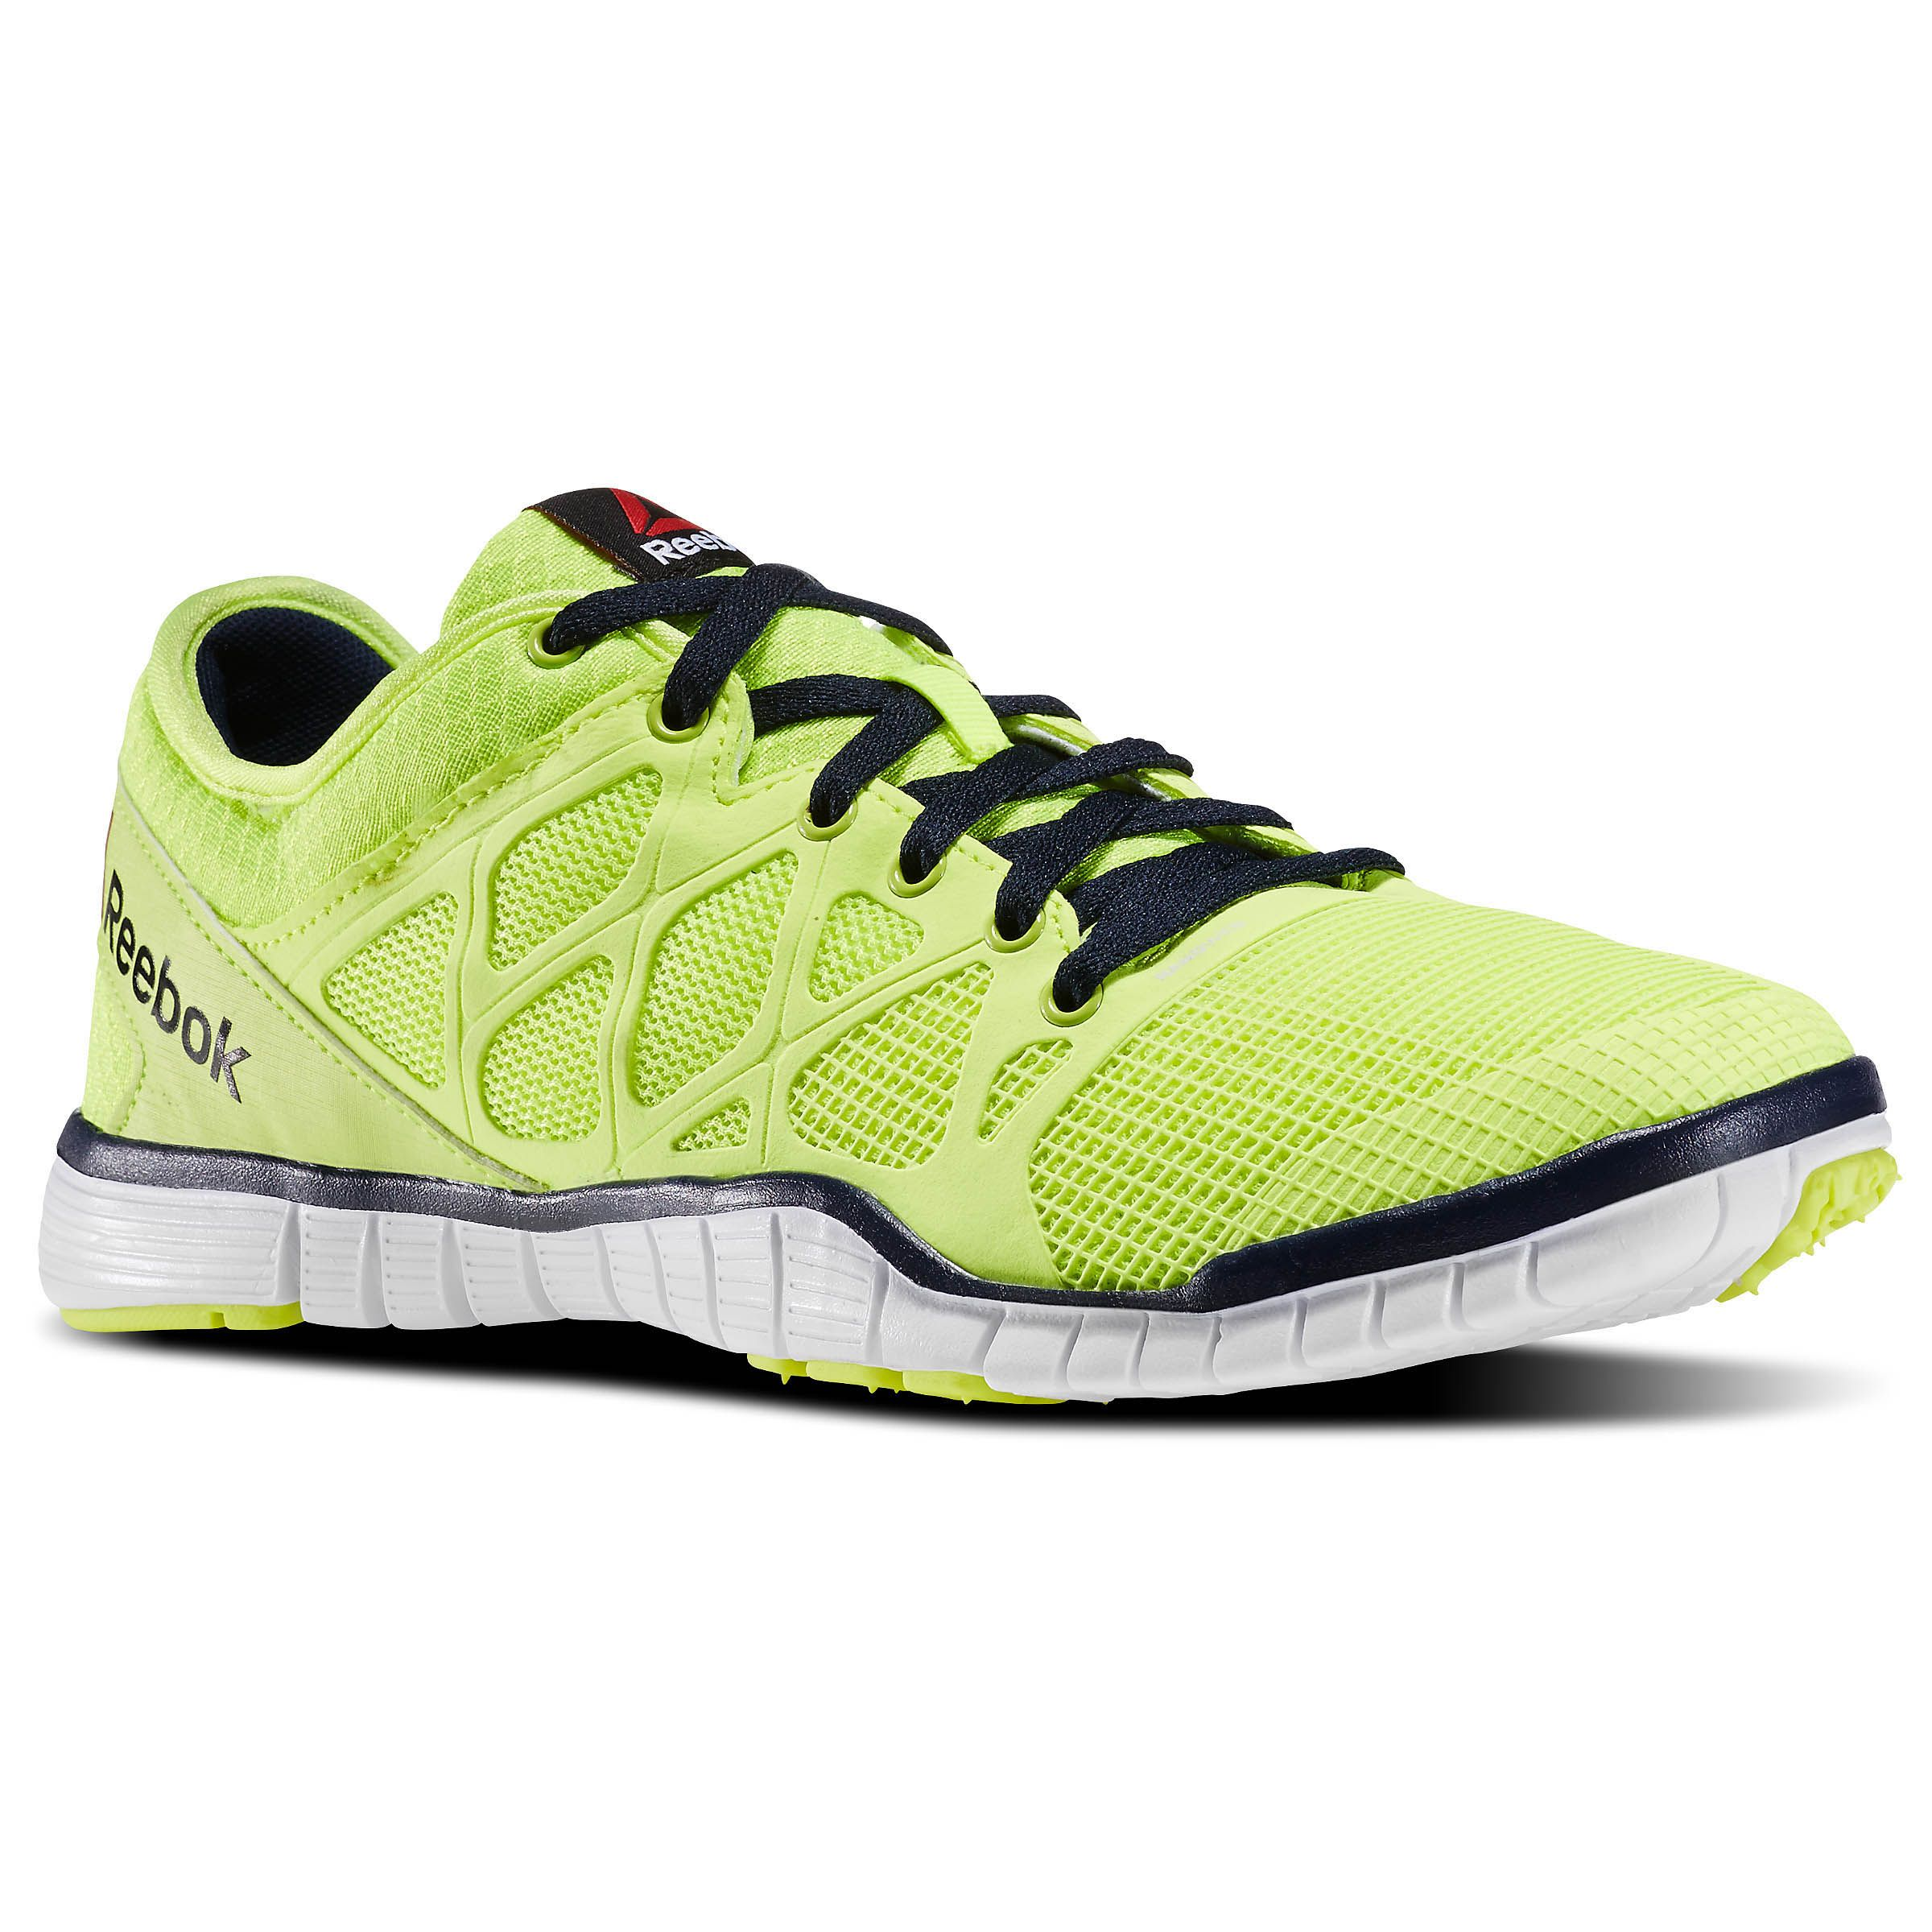 Reebok ZQuick TR 3.0 Chaussures • Fitness & Training